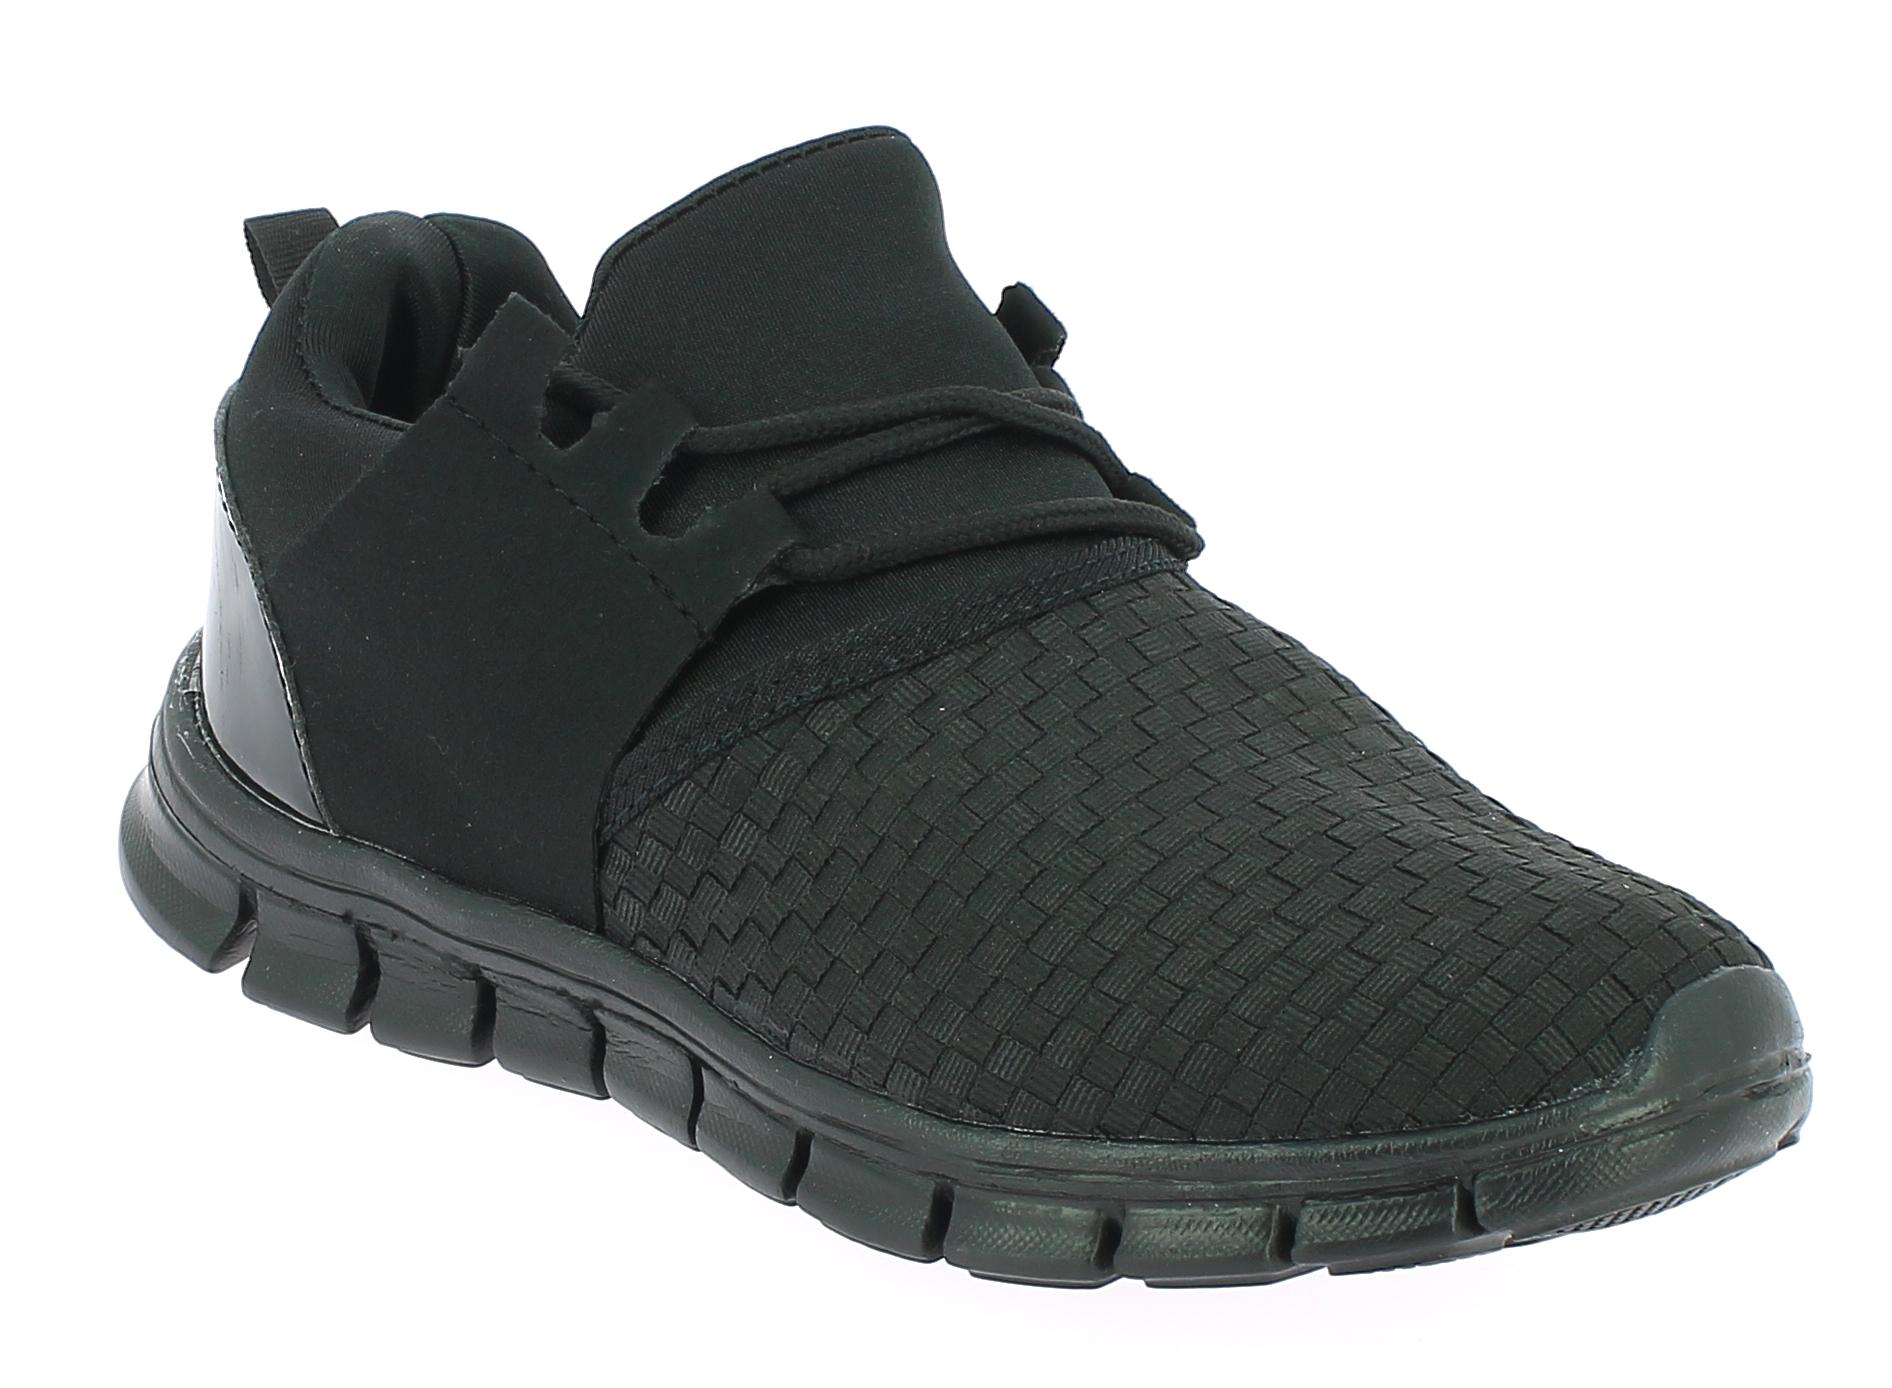 D.T NEW YORK Unisex Αθλητικό B415243 Μαύρο - IqShoes - B415243 BLACK -black-37/1 παπούτσια  new in